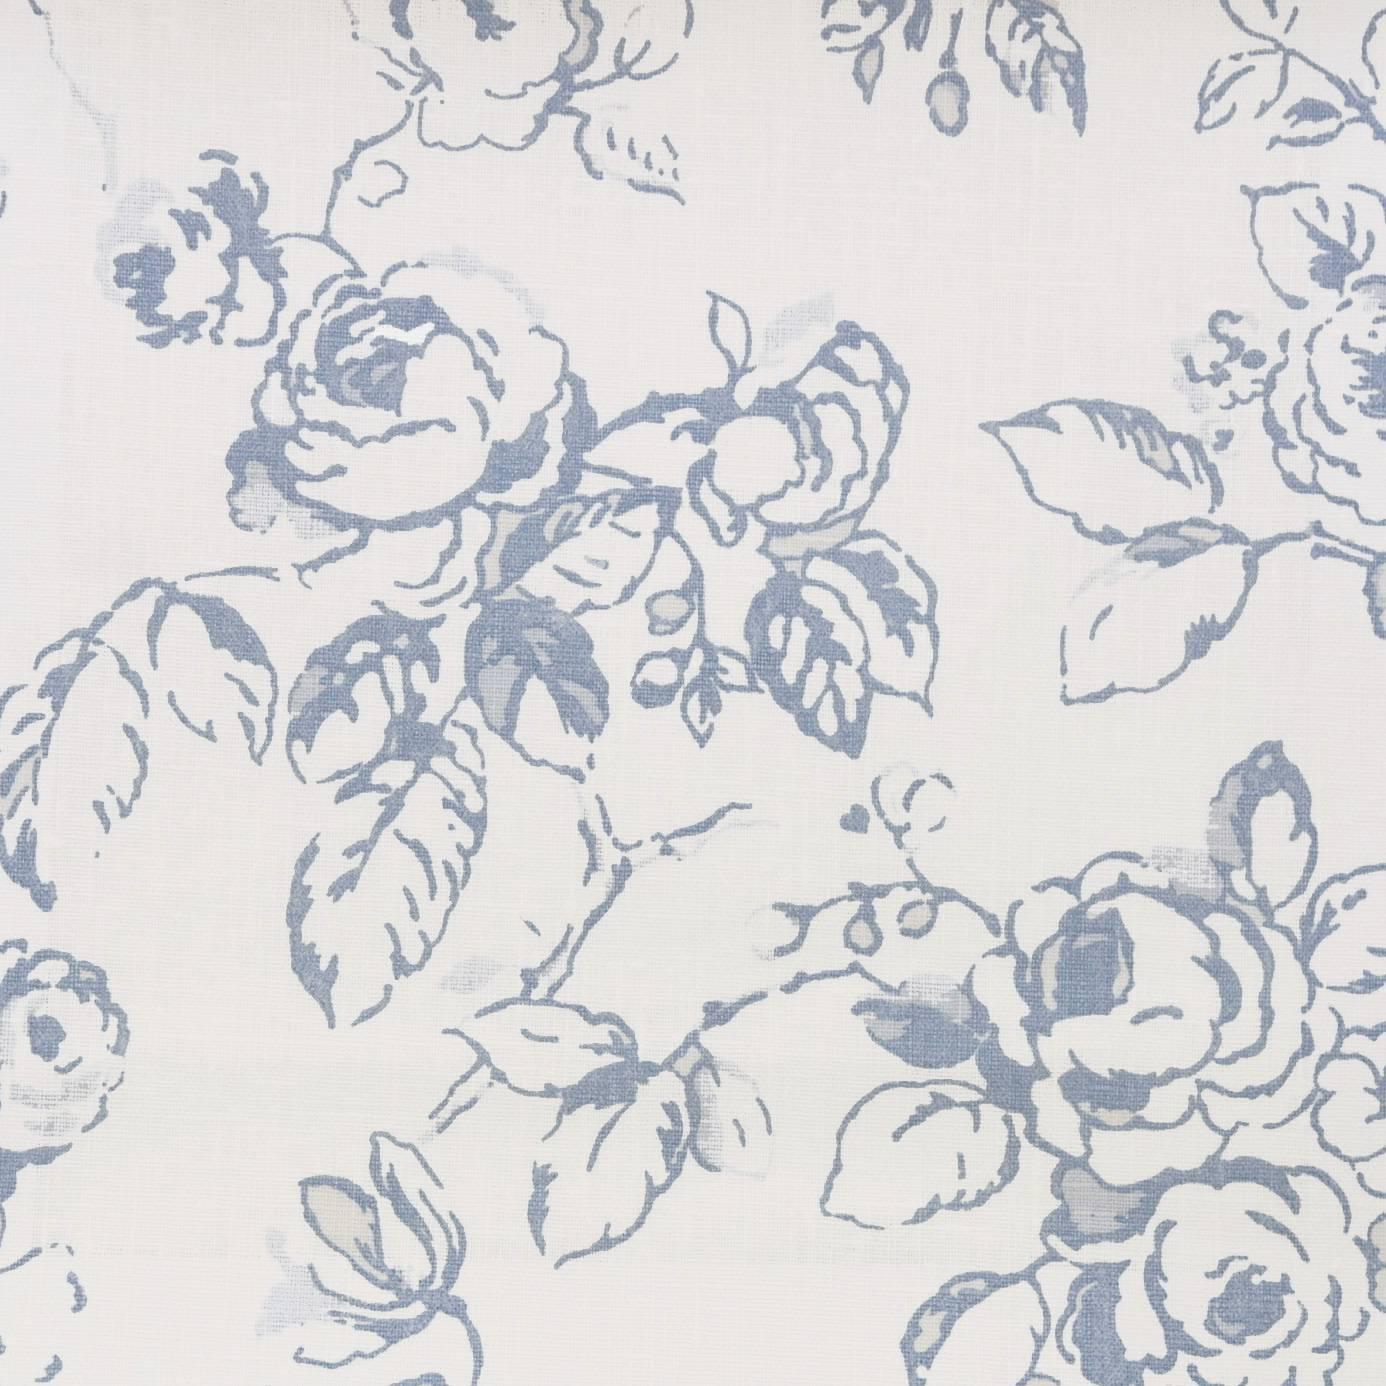 delphine fabric wedgewood f0428 07 clarke clarke clarisse fabrics collection. Black Bedroom Furniture Sets. Home Design Ideas